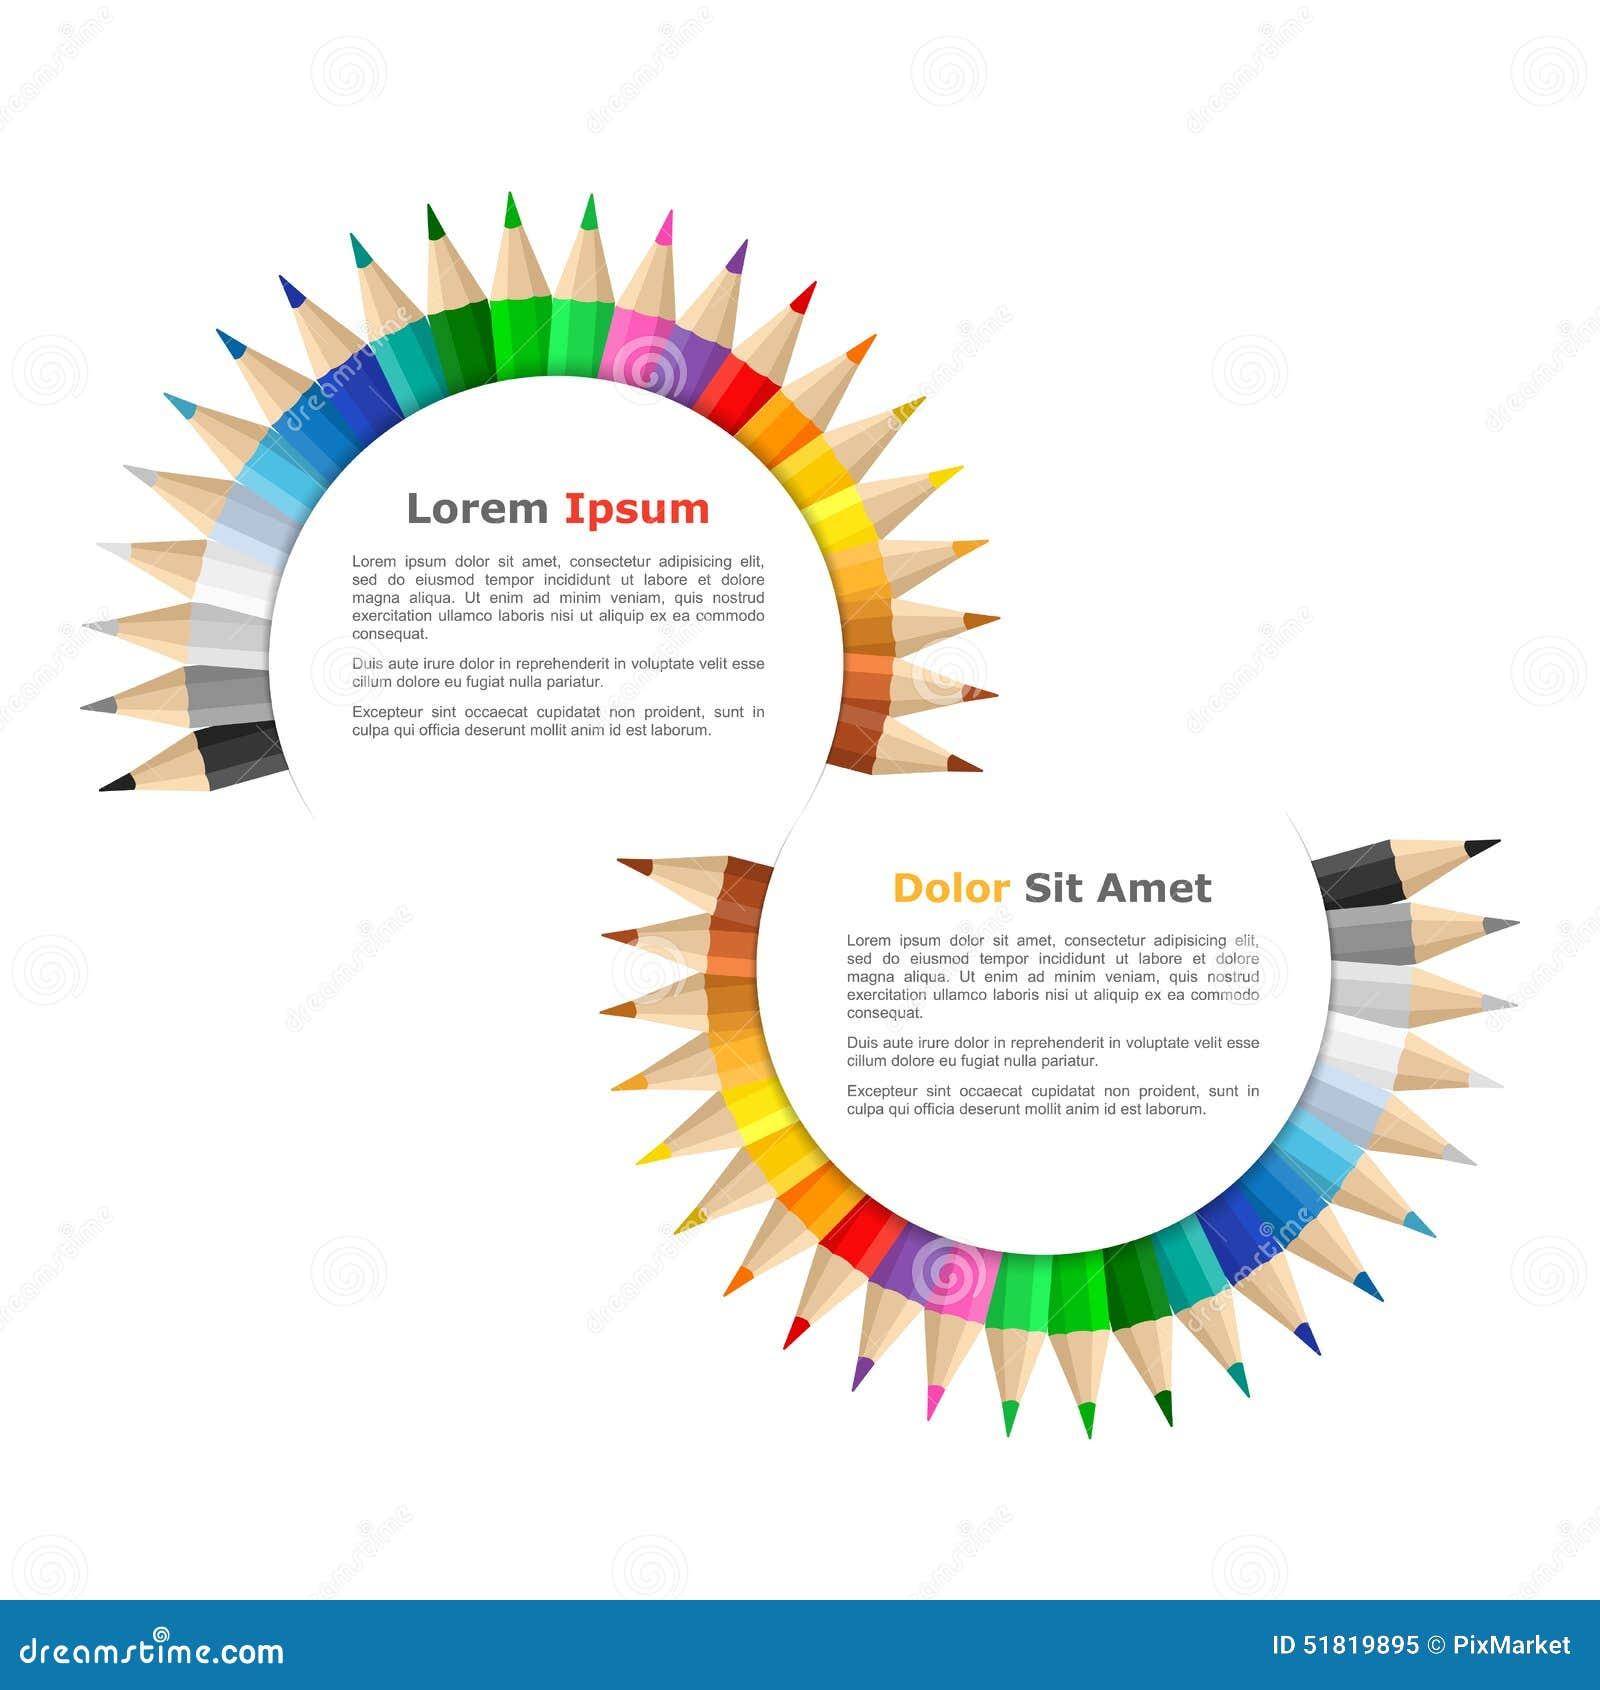 Bandeiras com lápis coloridos